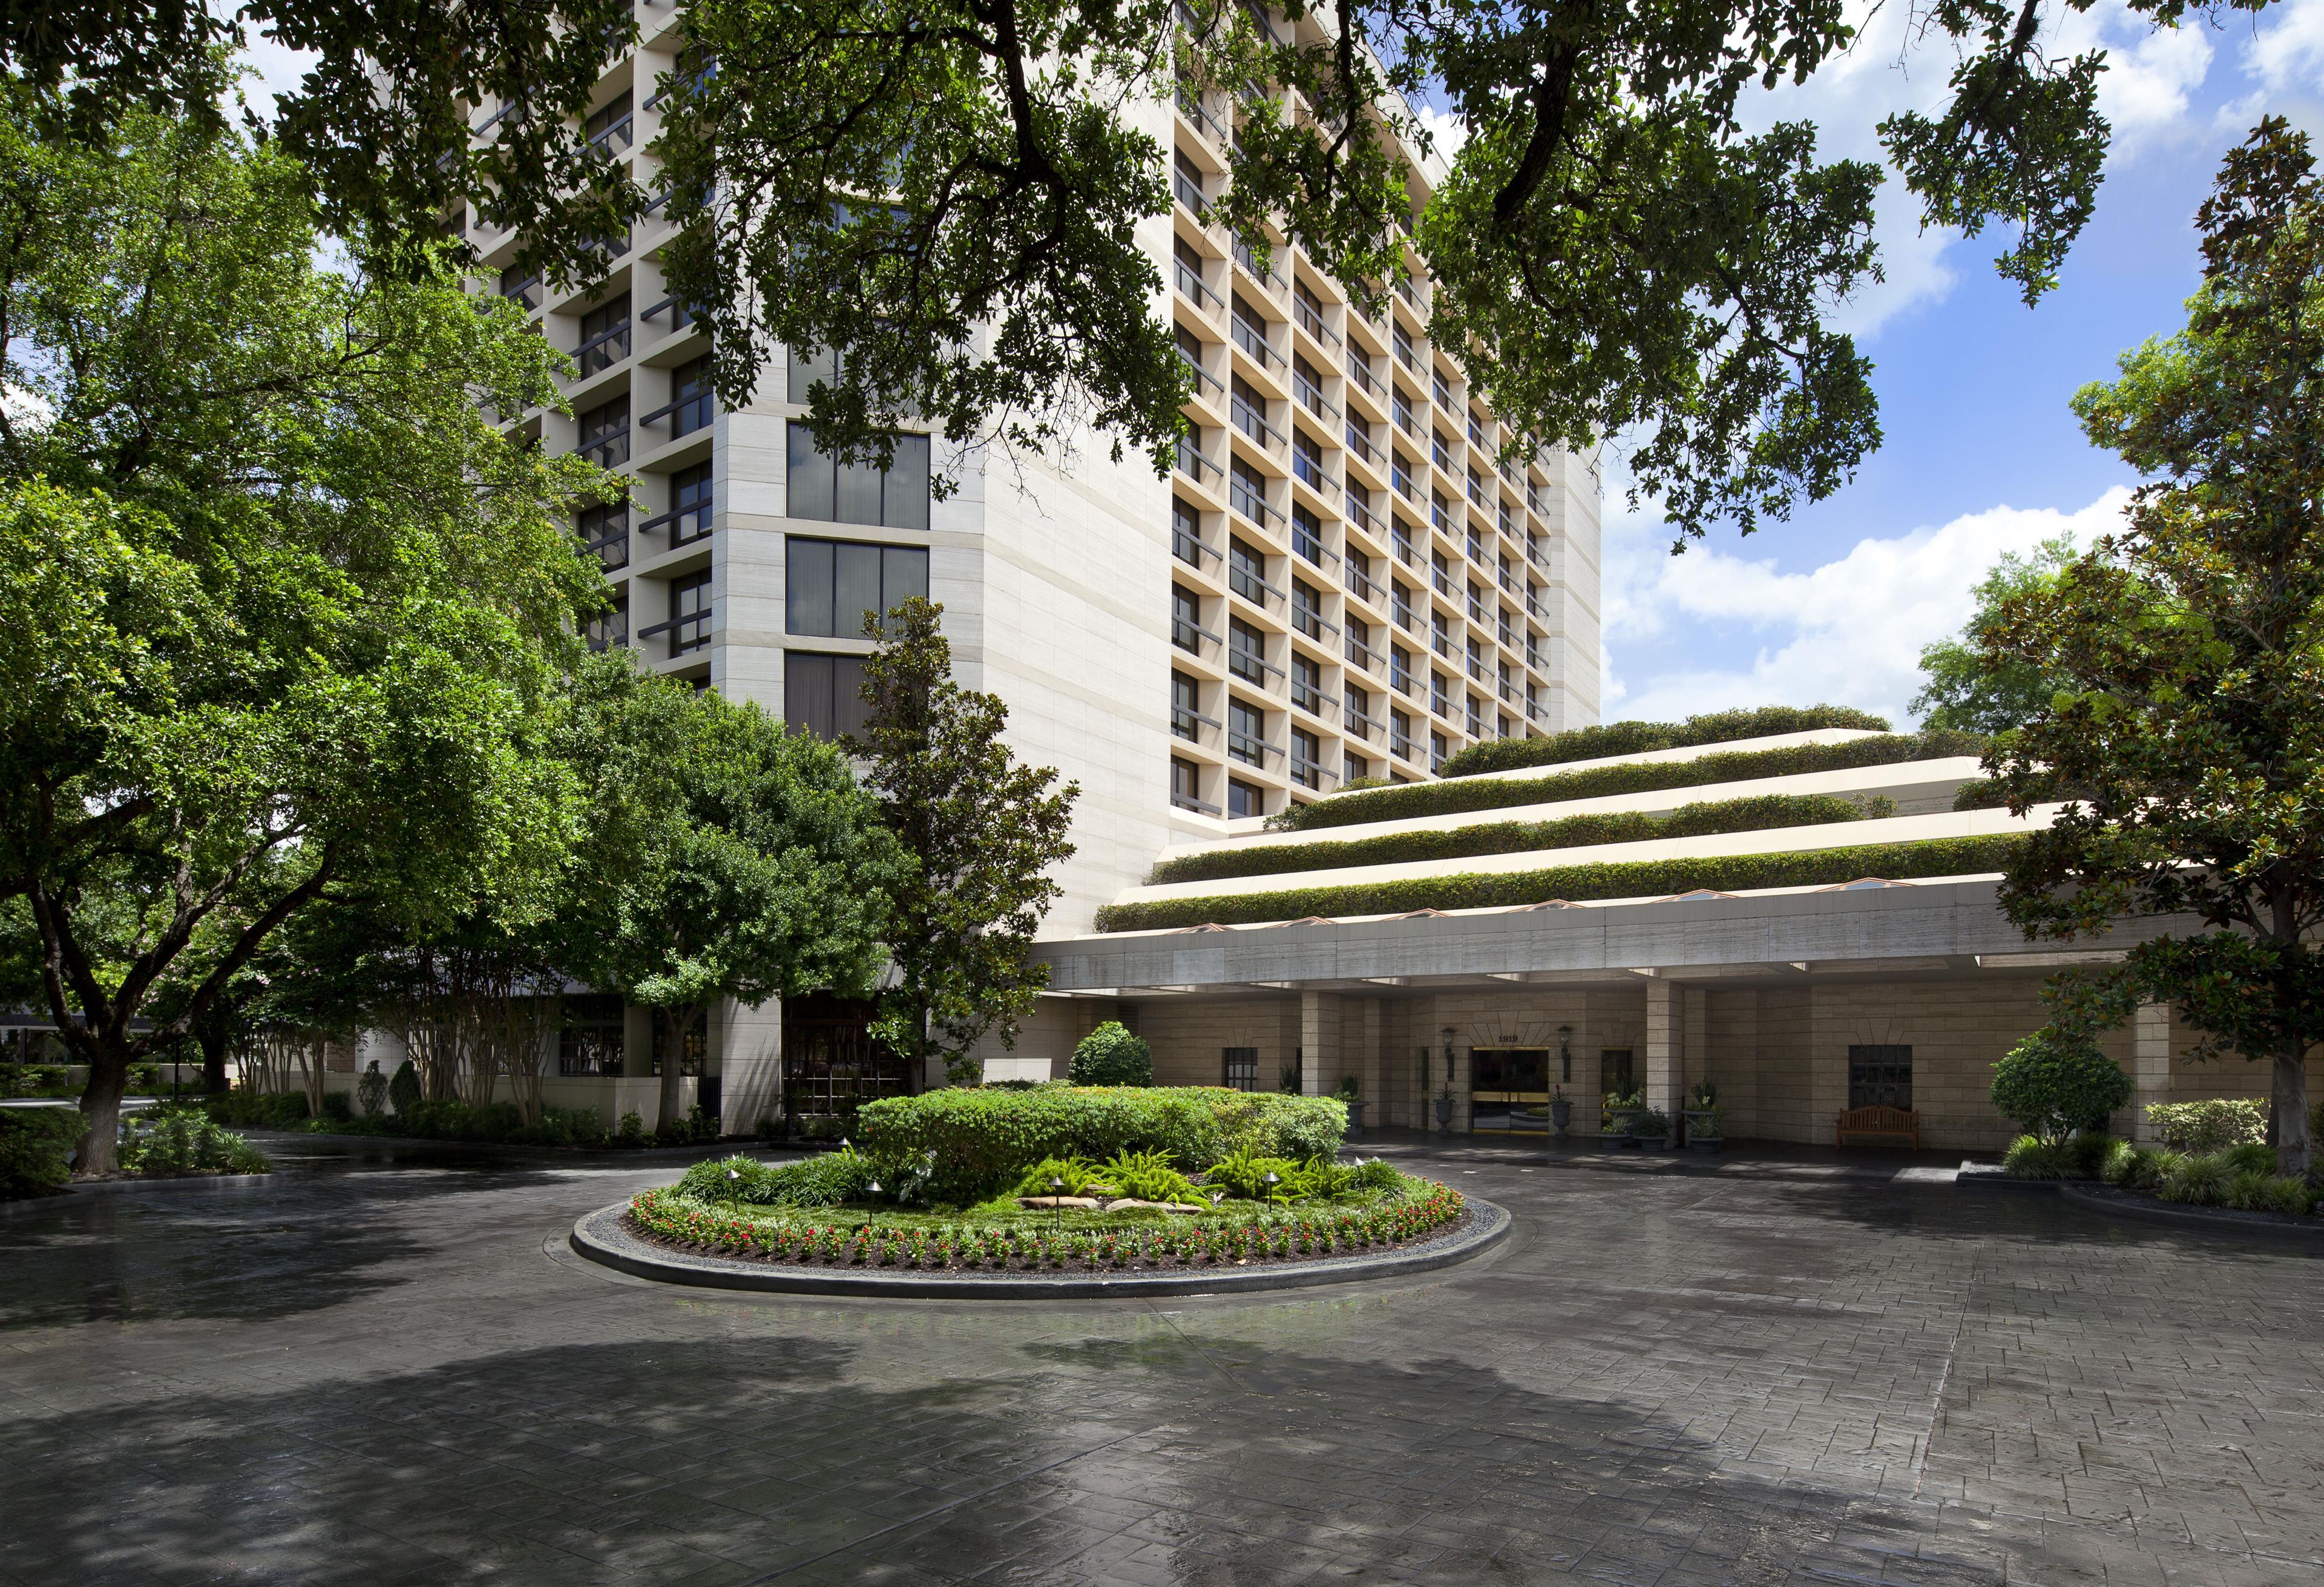 The St. Regis Houston image 0